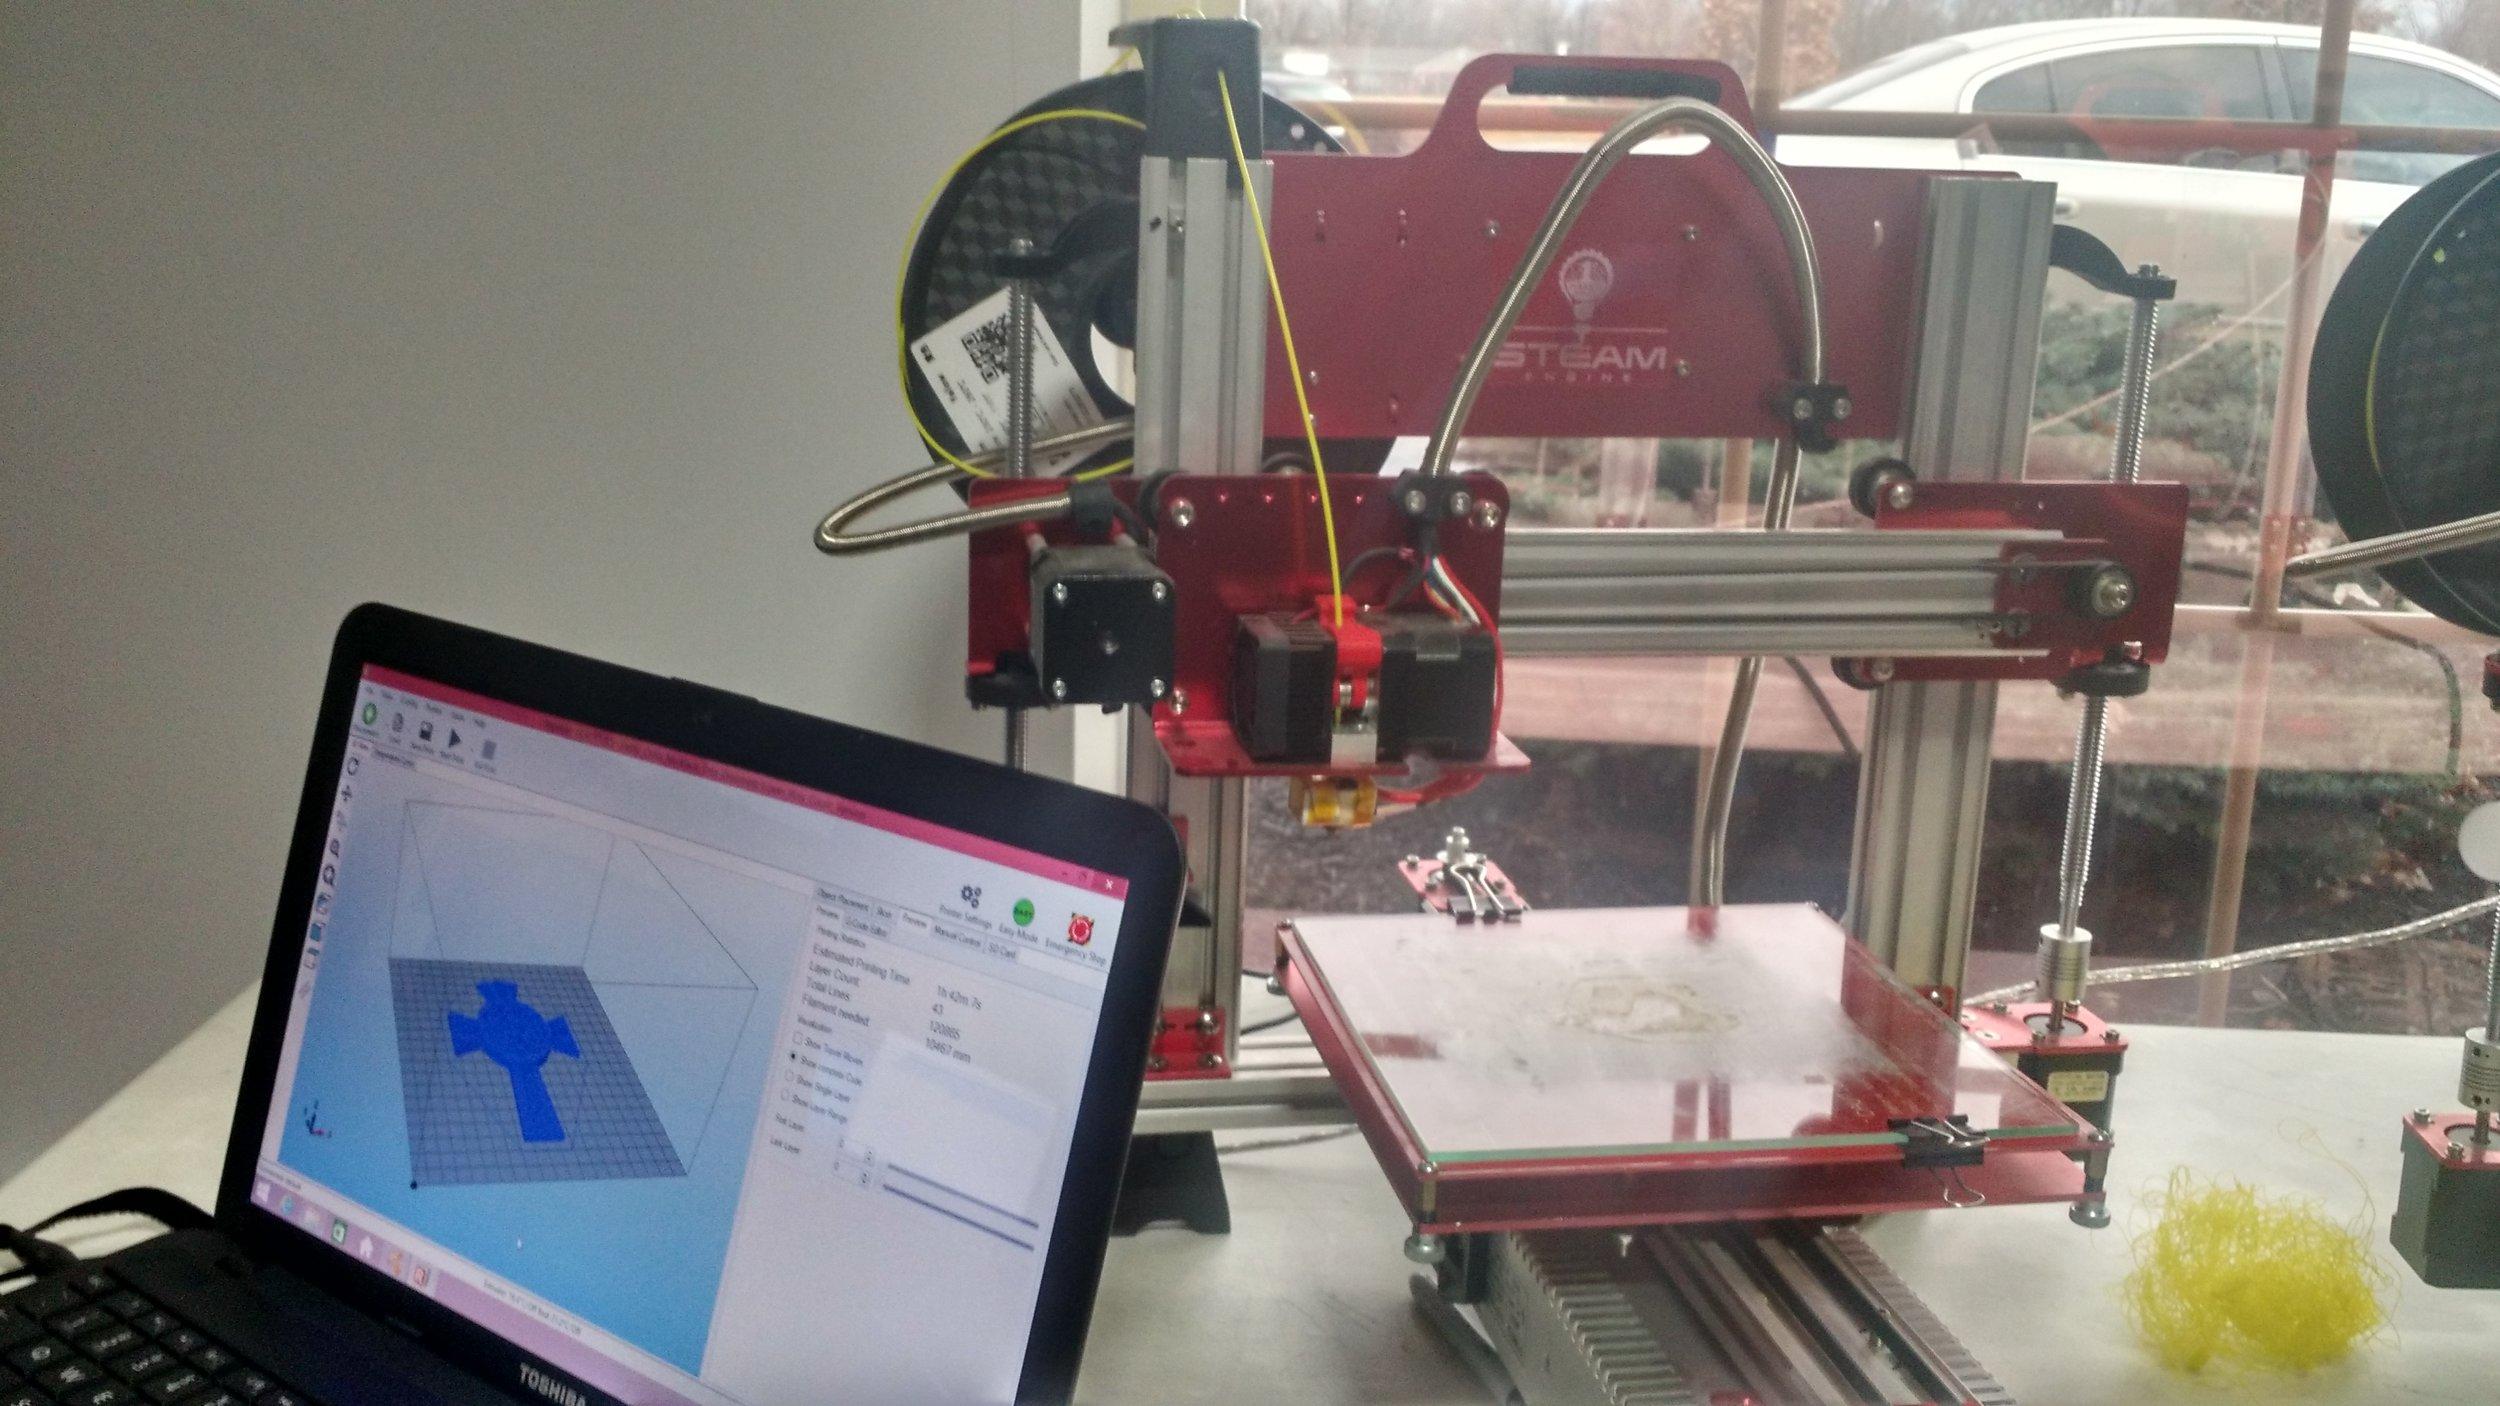 A 3D printer linked to computer design software.